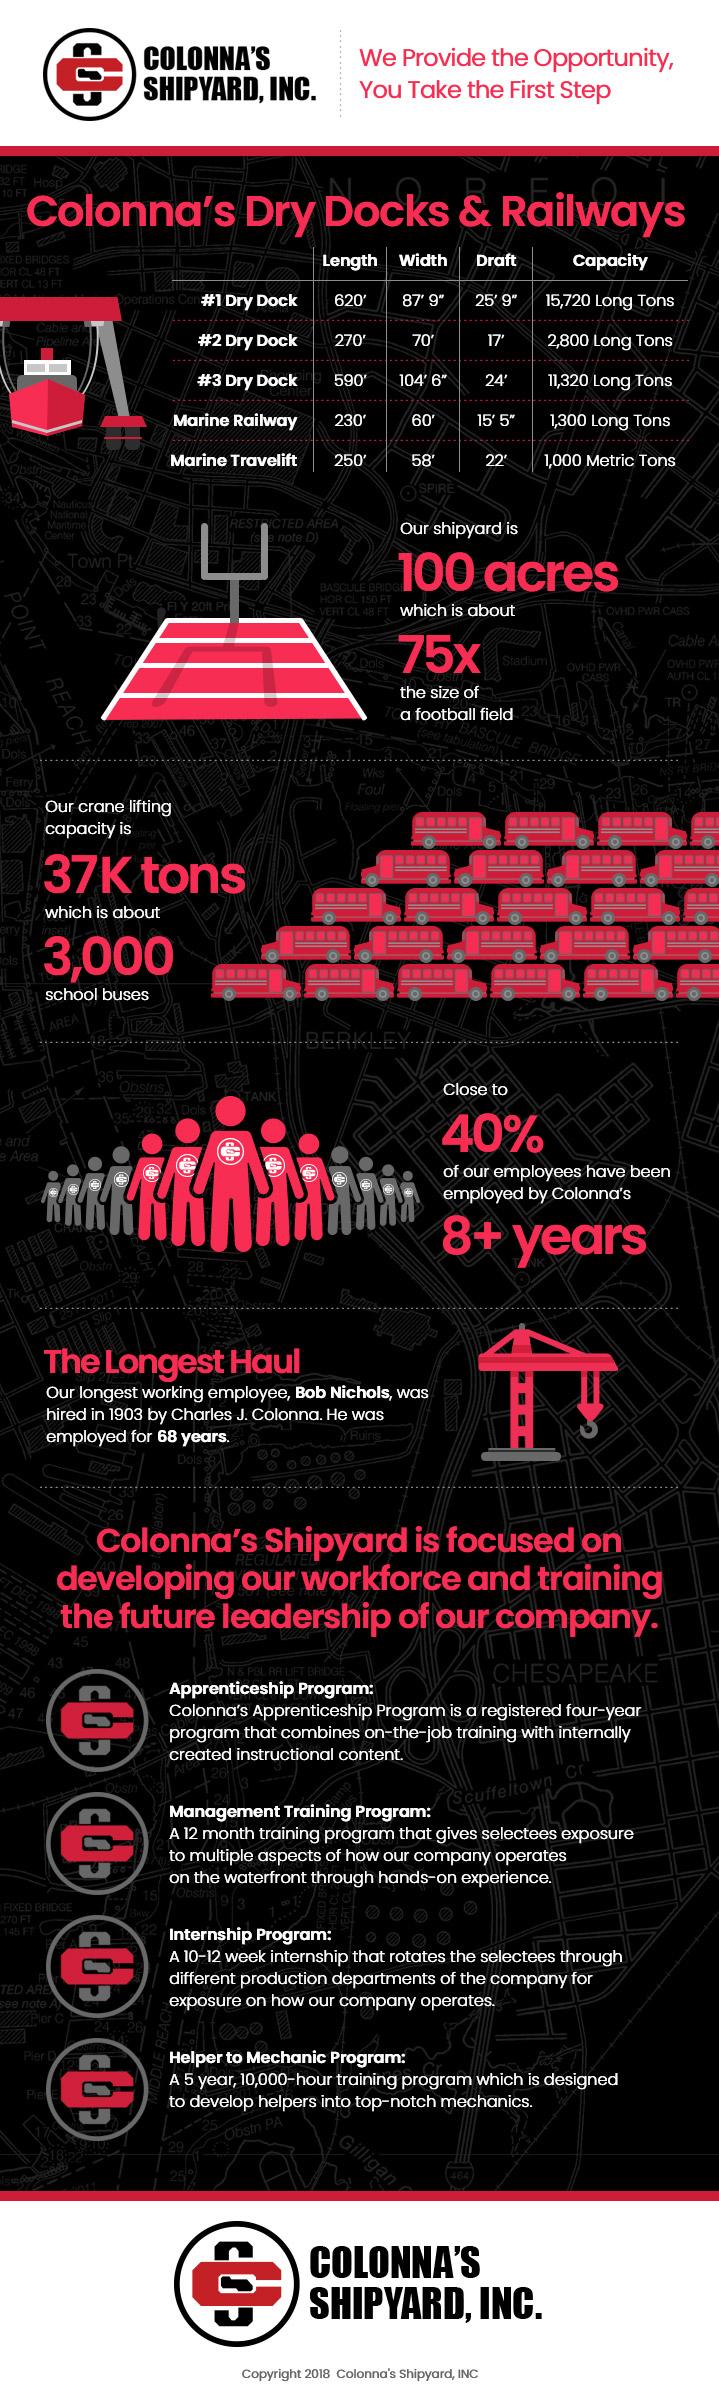 Colonna's Shipyard Career Infographic